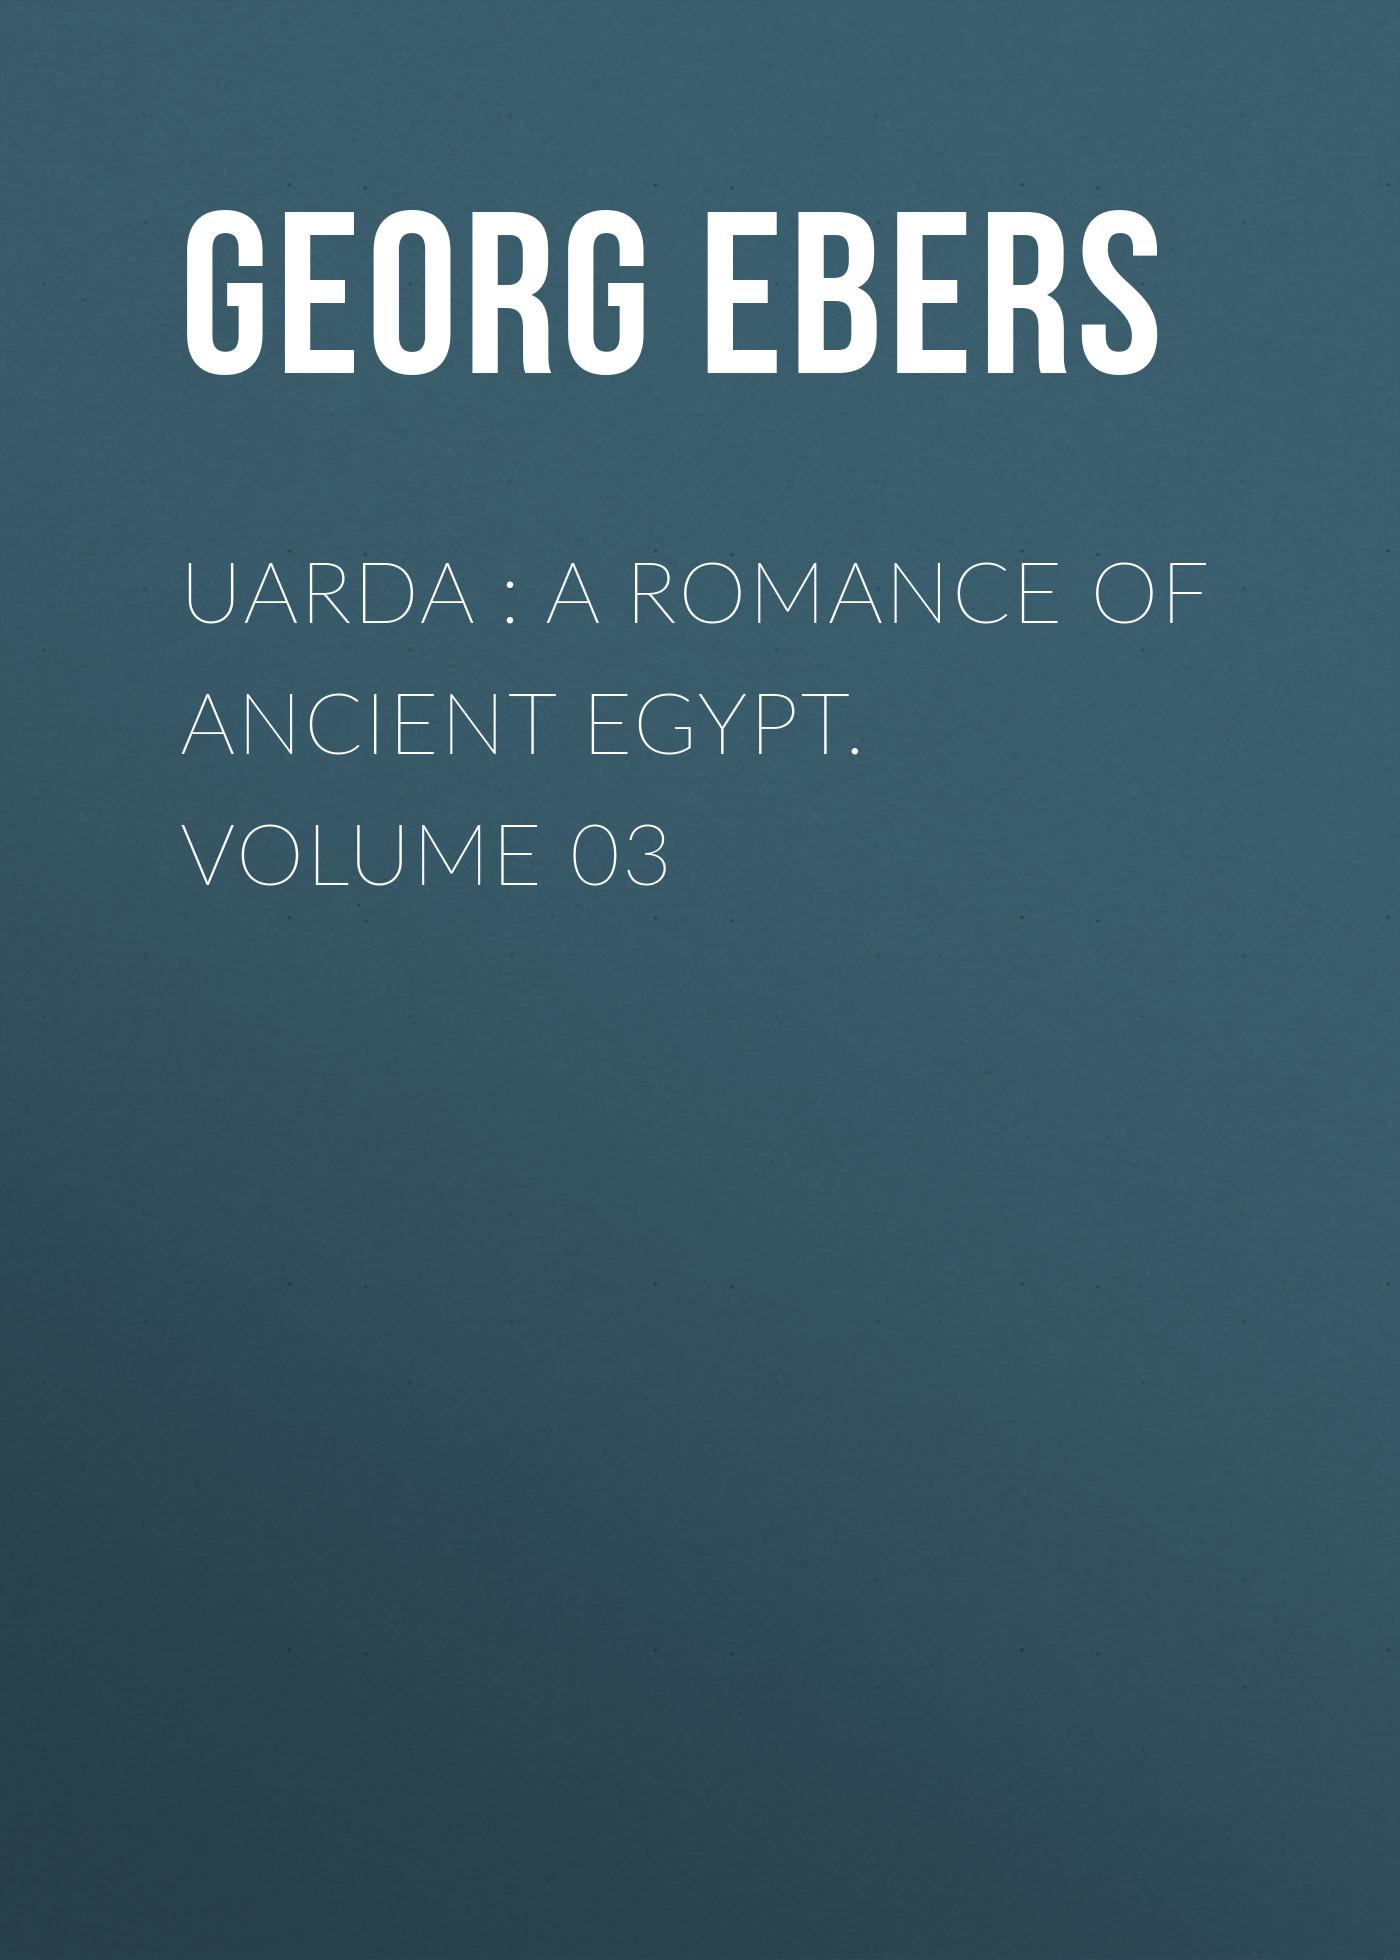 Georg Ebers Uarda : a Romance of Ancient Egypt. Volume 03 ancient egypt